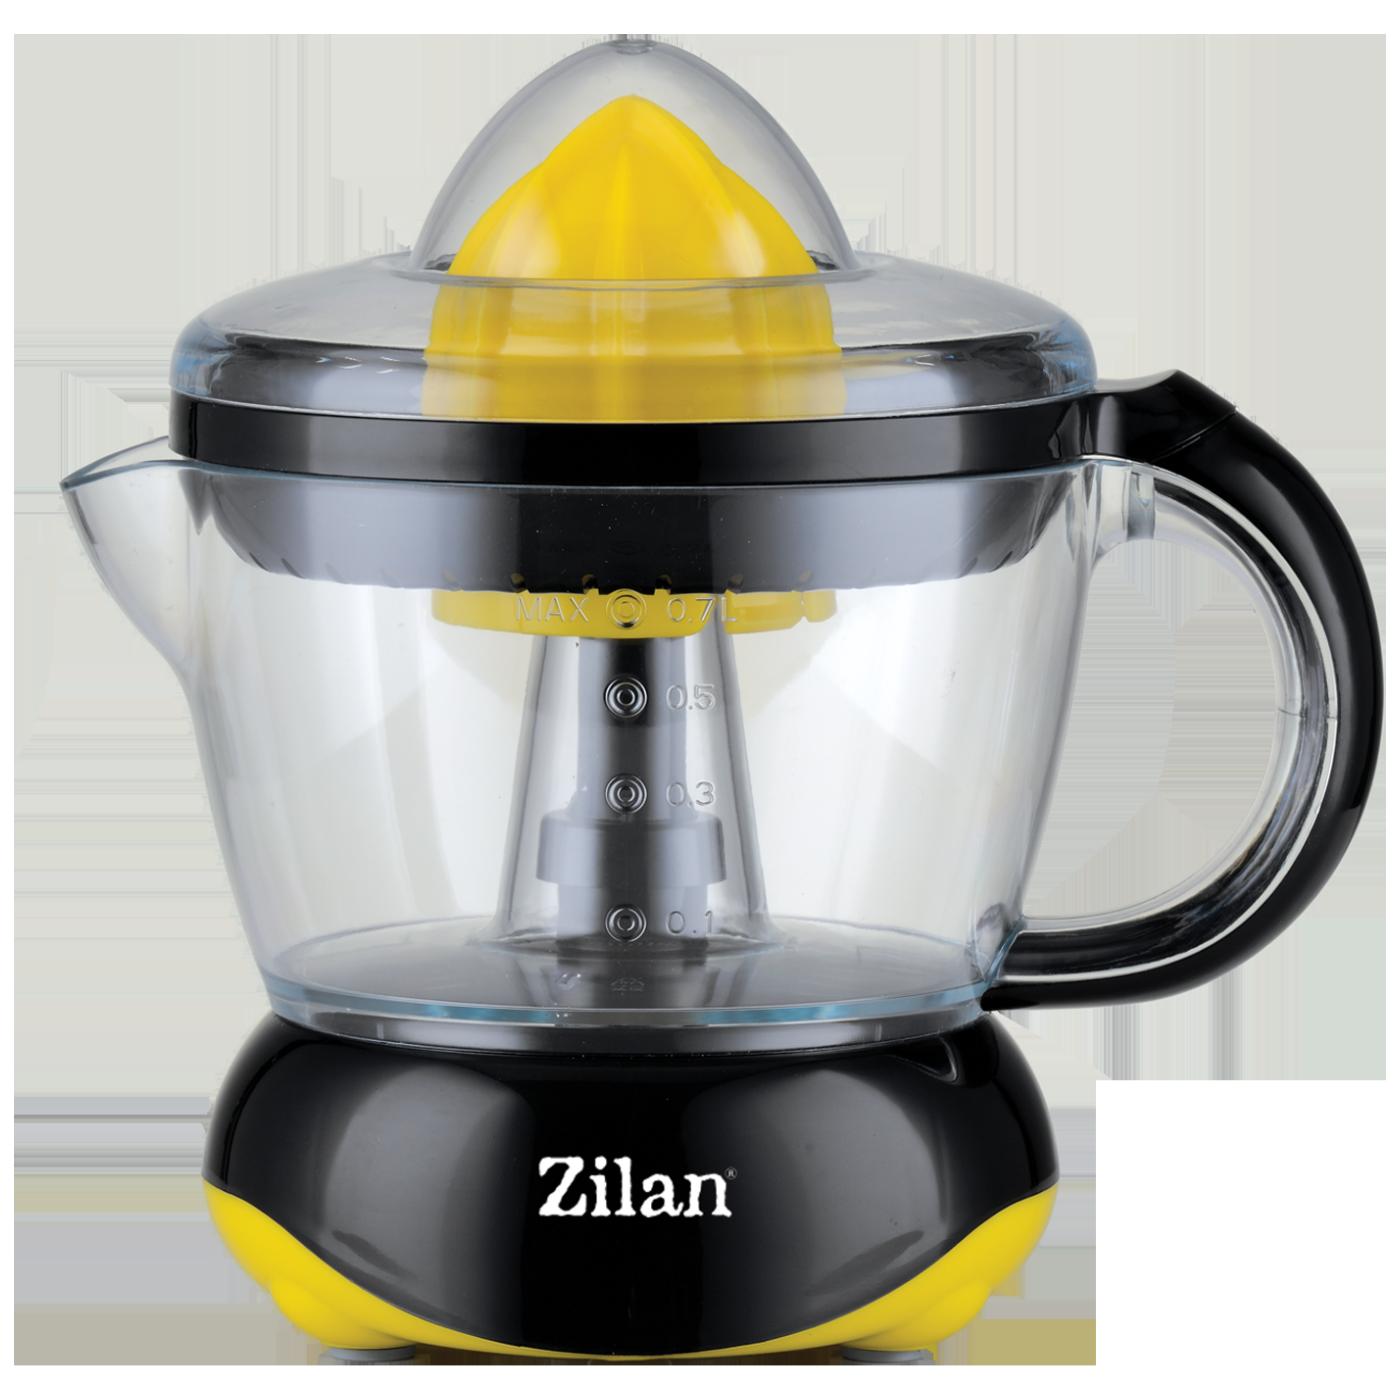 Zilan - ZLN7825/YL